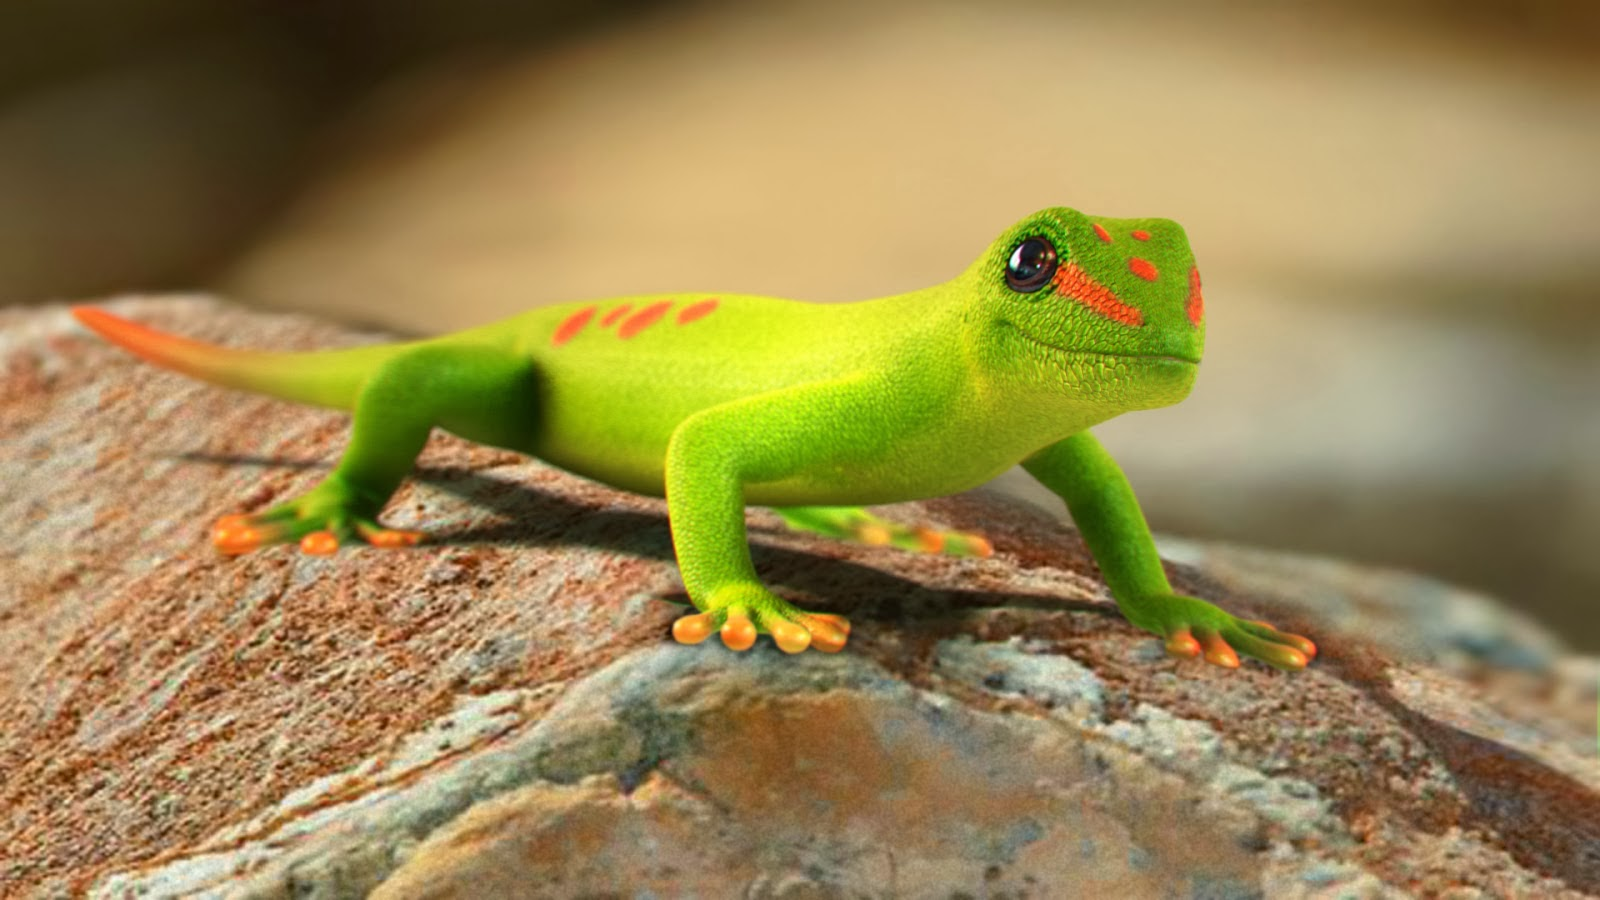 Gecko Wallpapers Desktop 1600x900   4USkY 1600x900